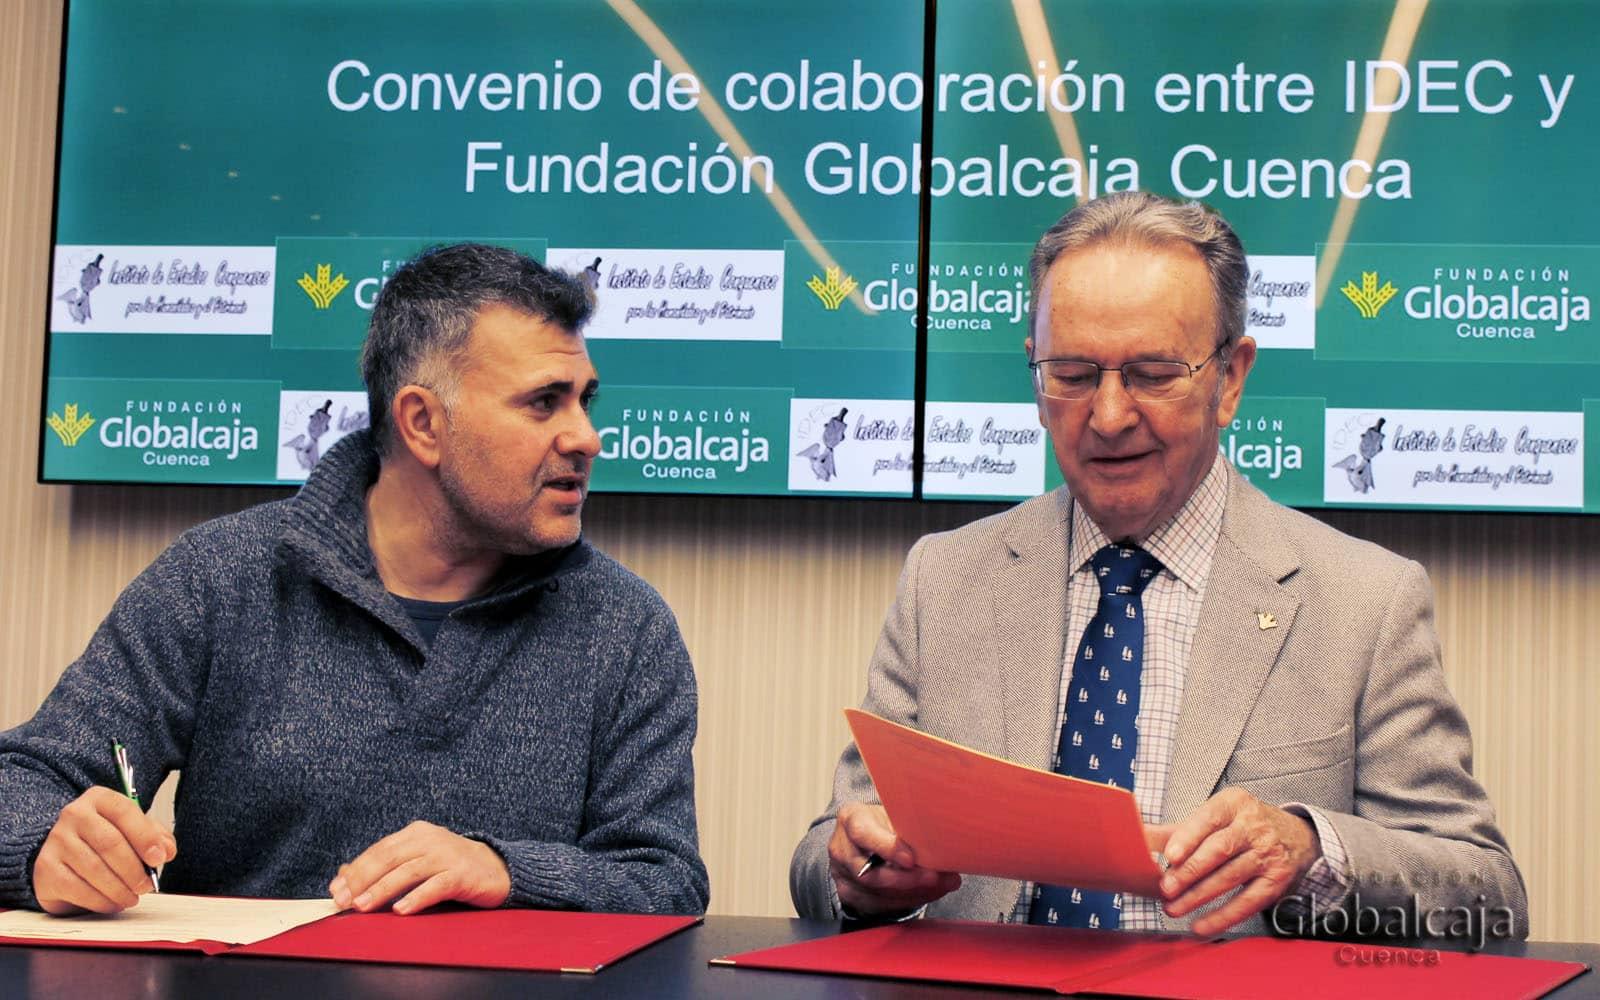 https://blog.globalcaja.es/wp-content/uploads/2018/07/MG_9810_W.jpg